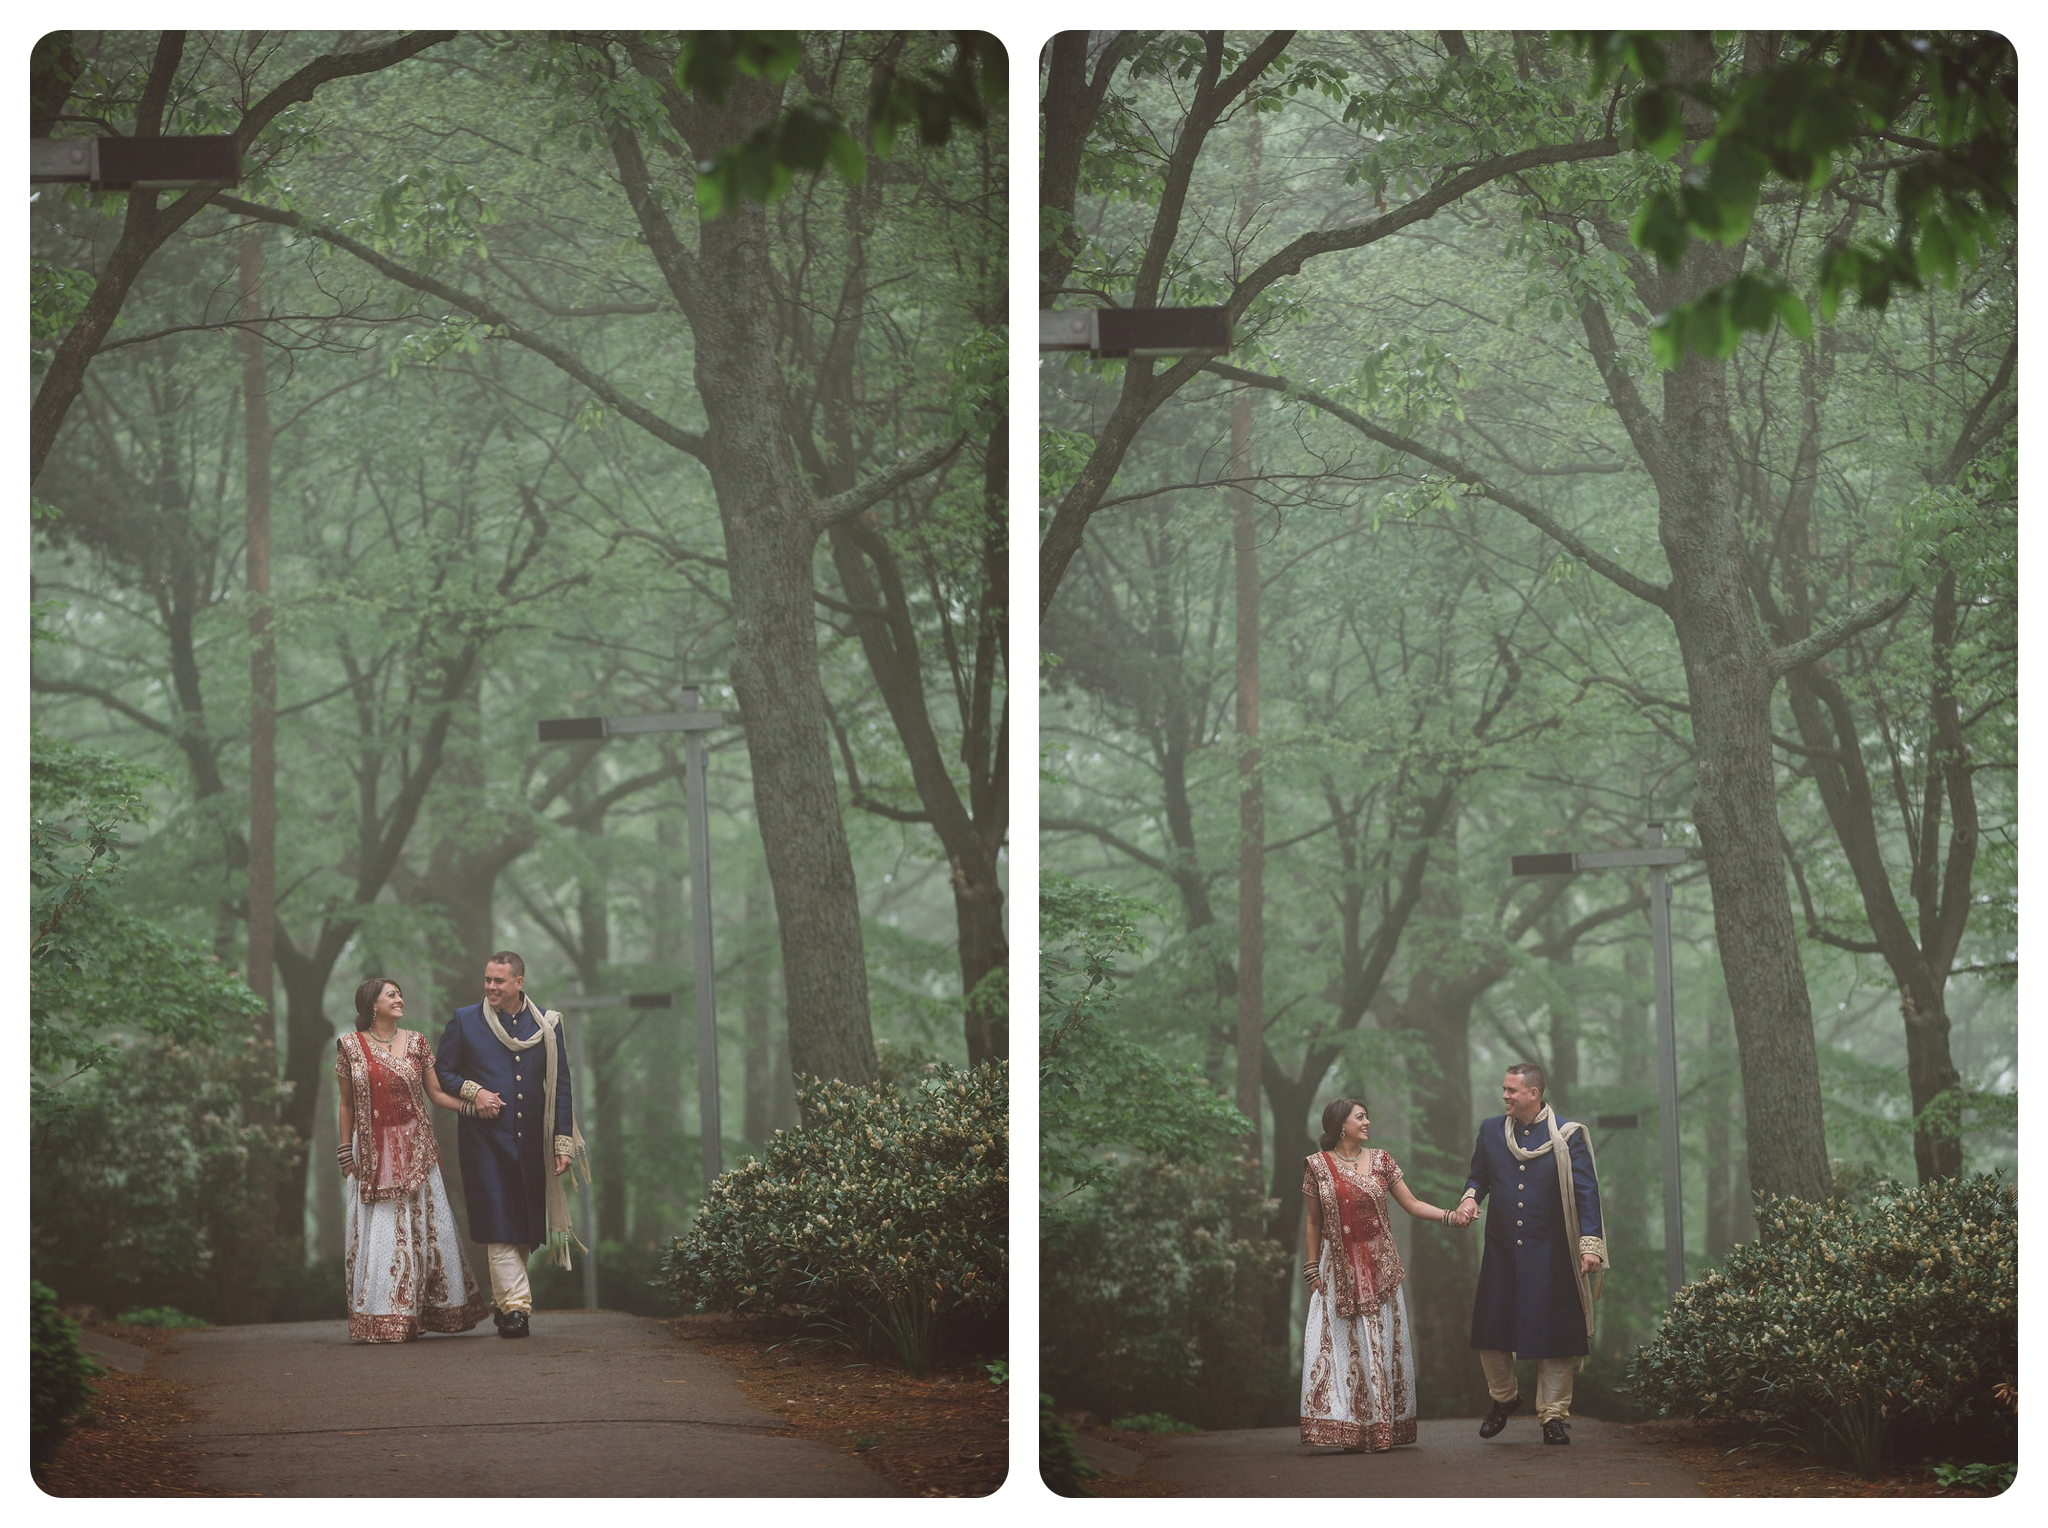 Virginia-Weddings-Center-in-the-Square-Pat-Cori-Photography-027.jpg